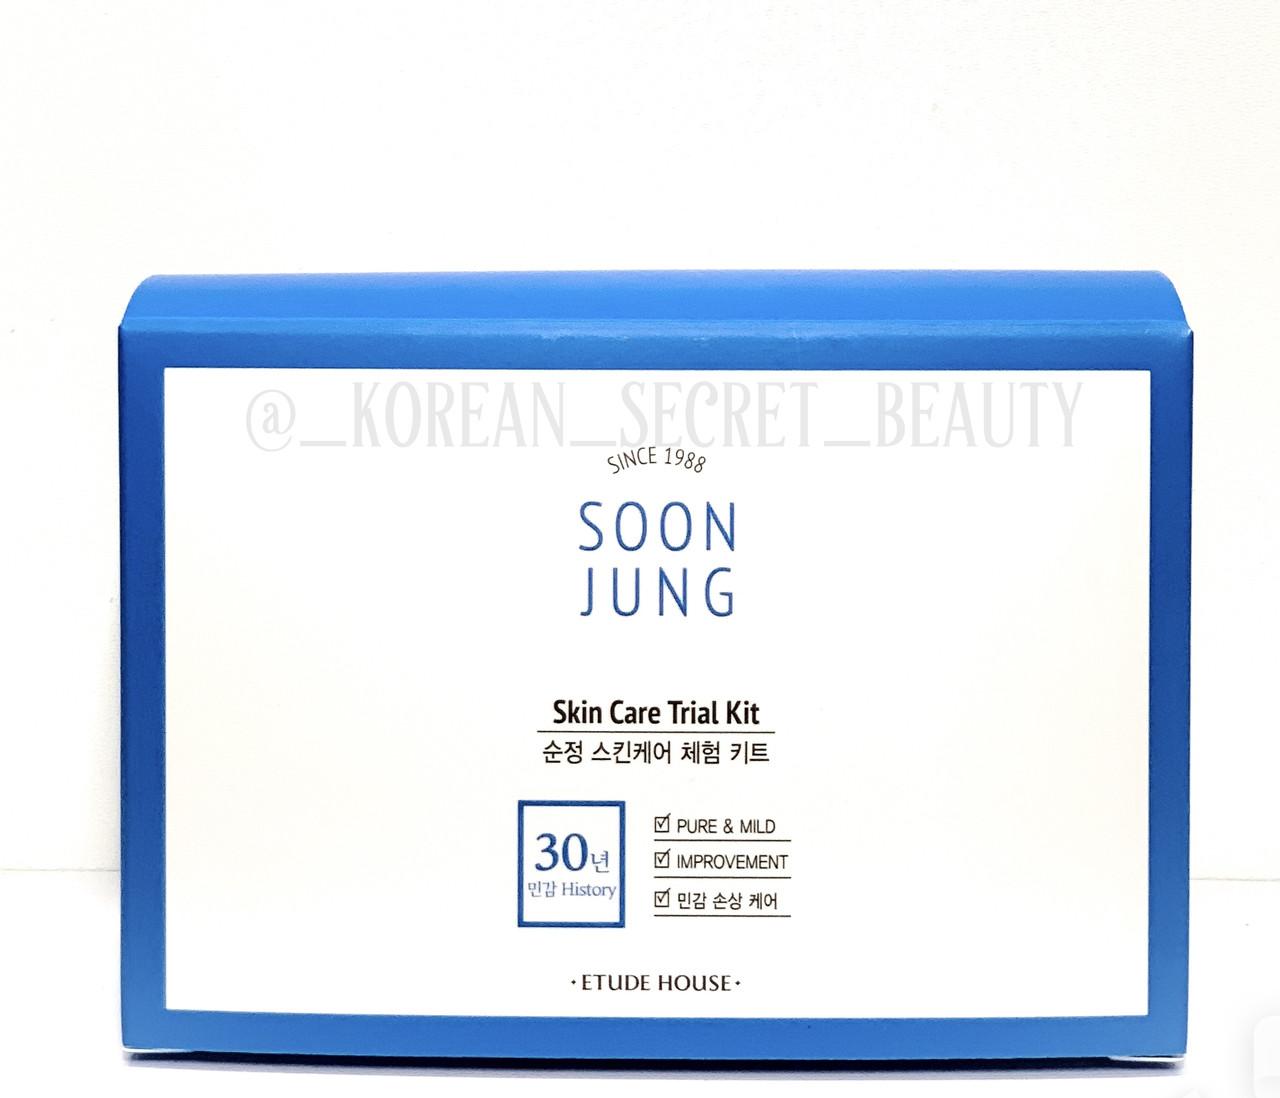 Міні-набір для чутливої шкіри Etude House Soon Jung Skin Care trial kit